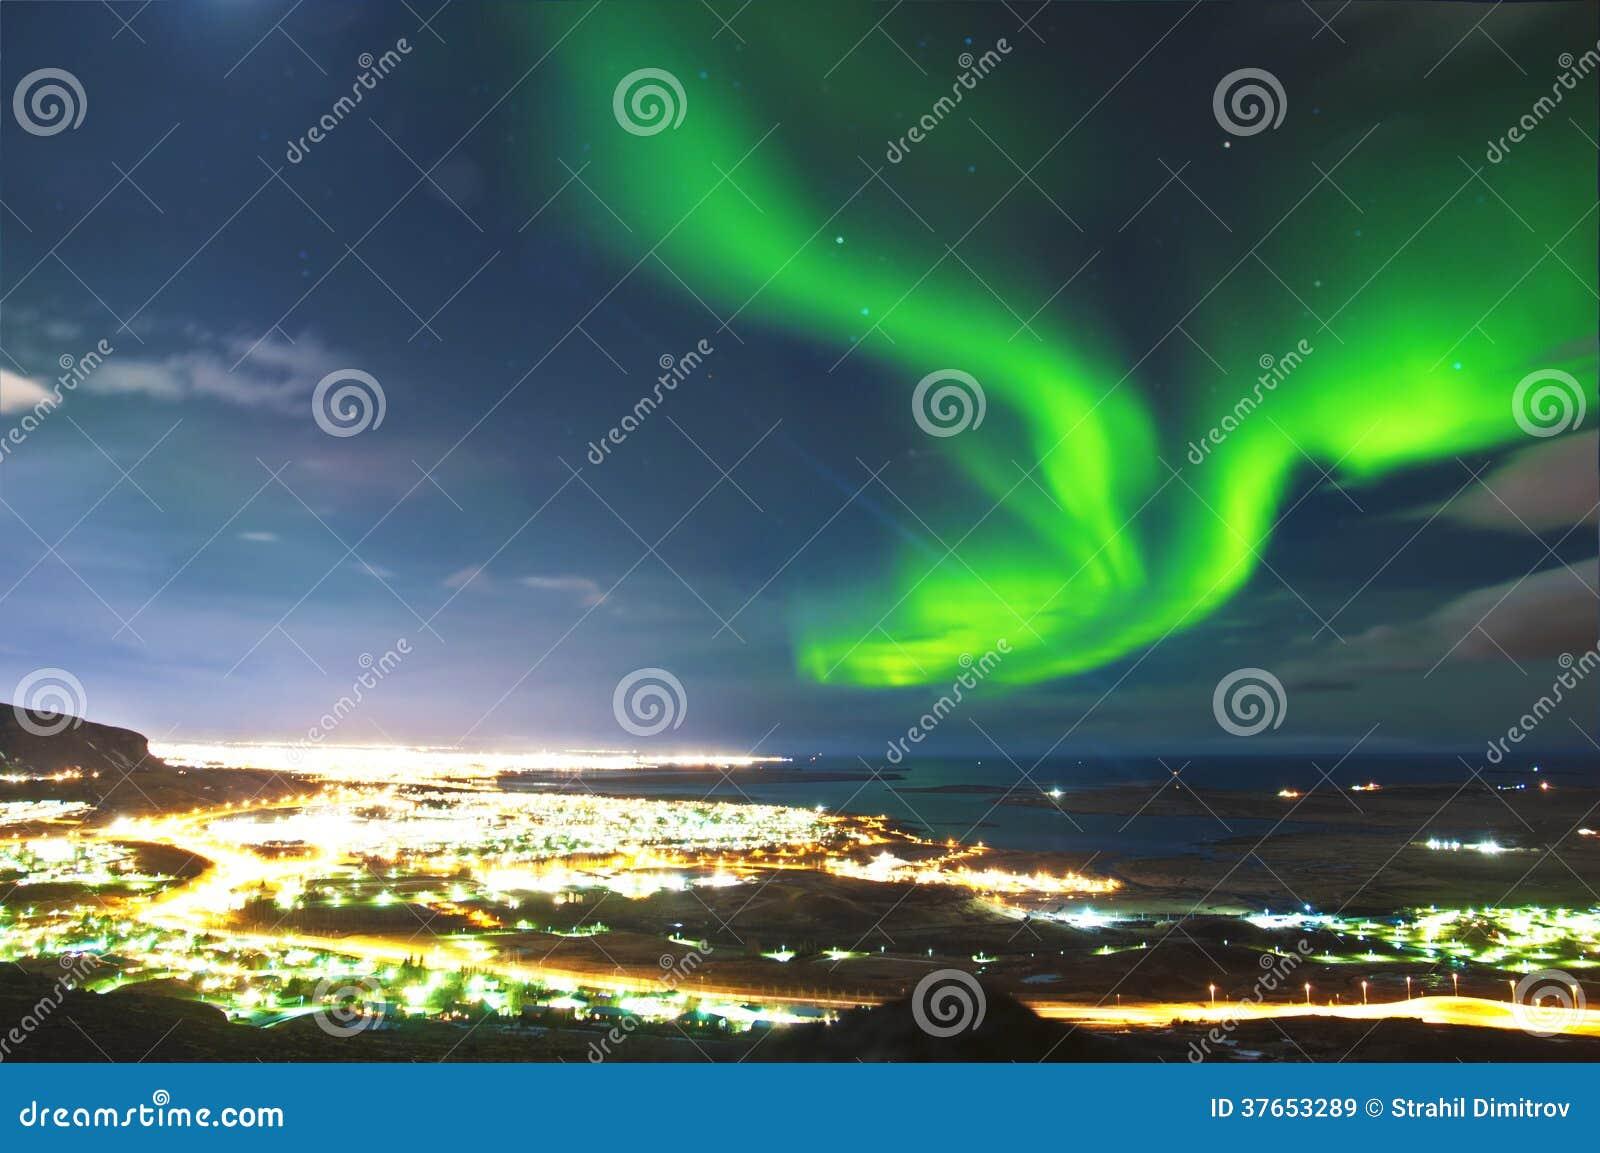 free online dating iceland Reykjavik online dating for reykjavik singles 1,500,000 daily active members.